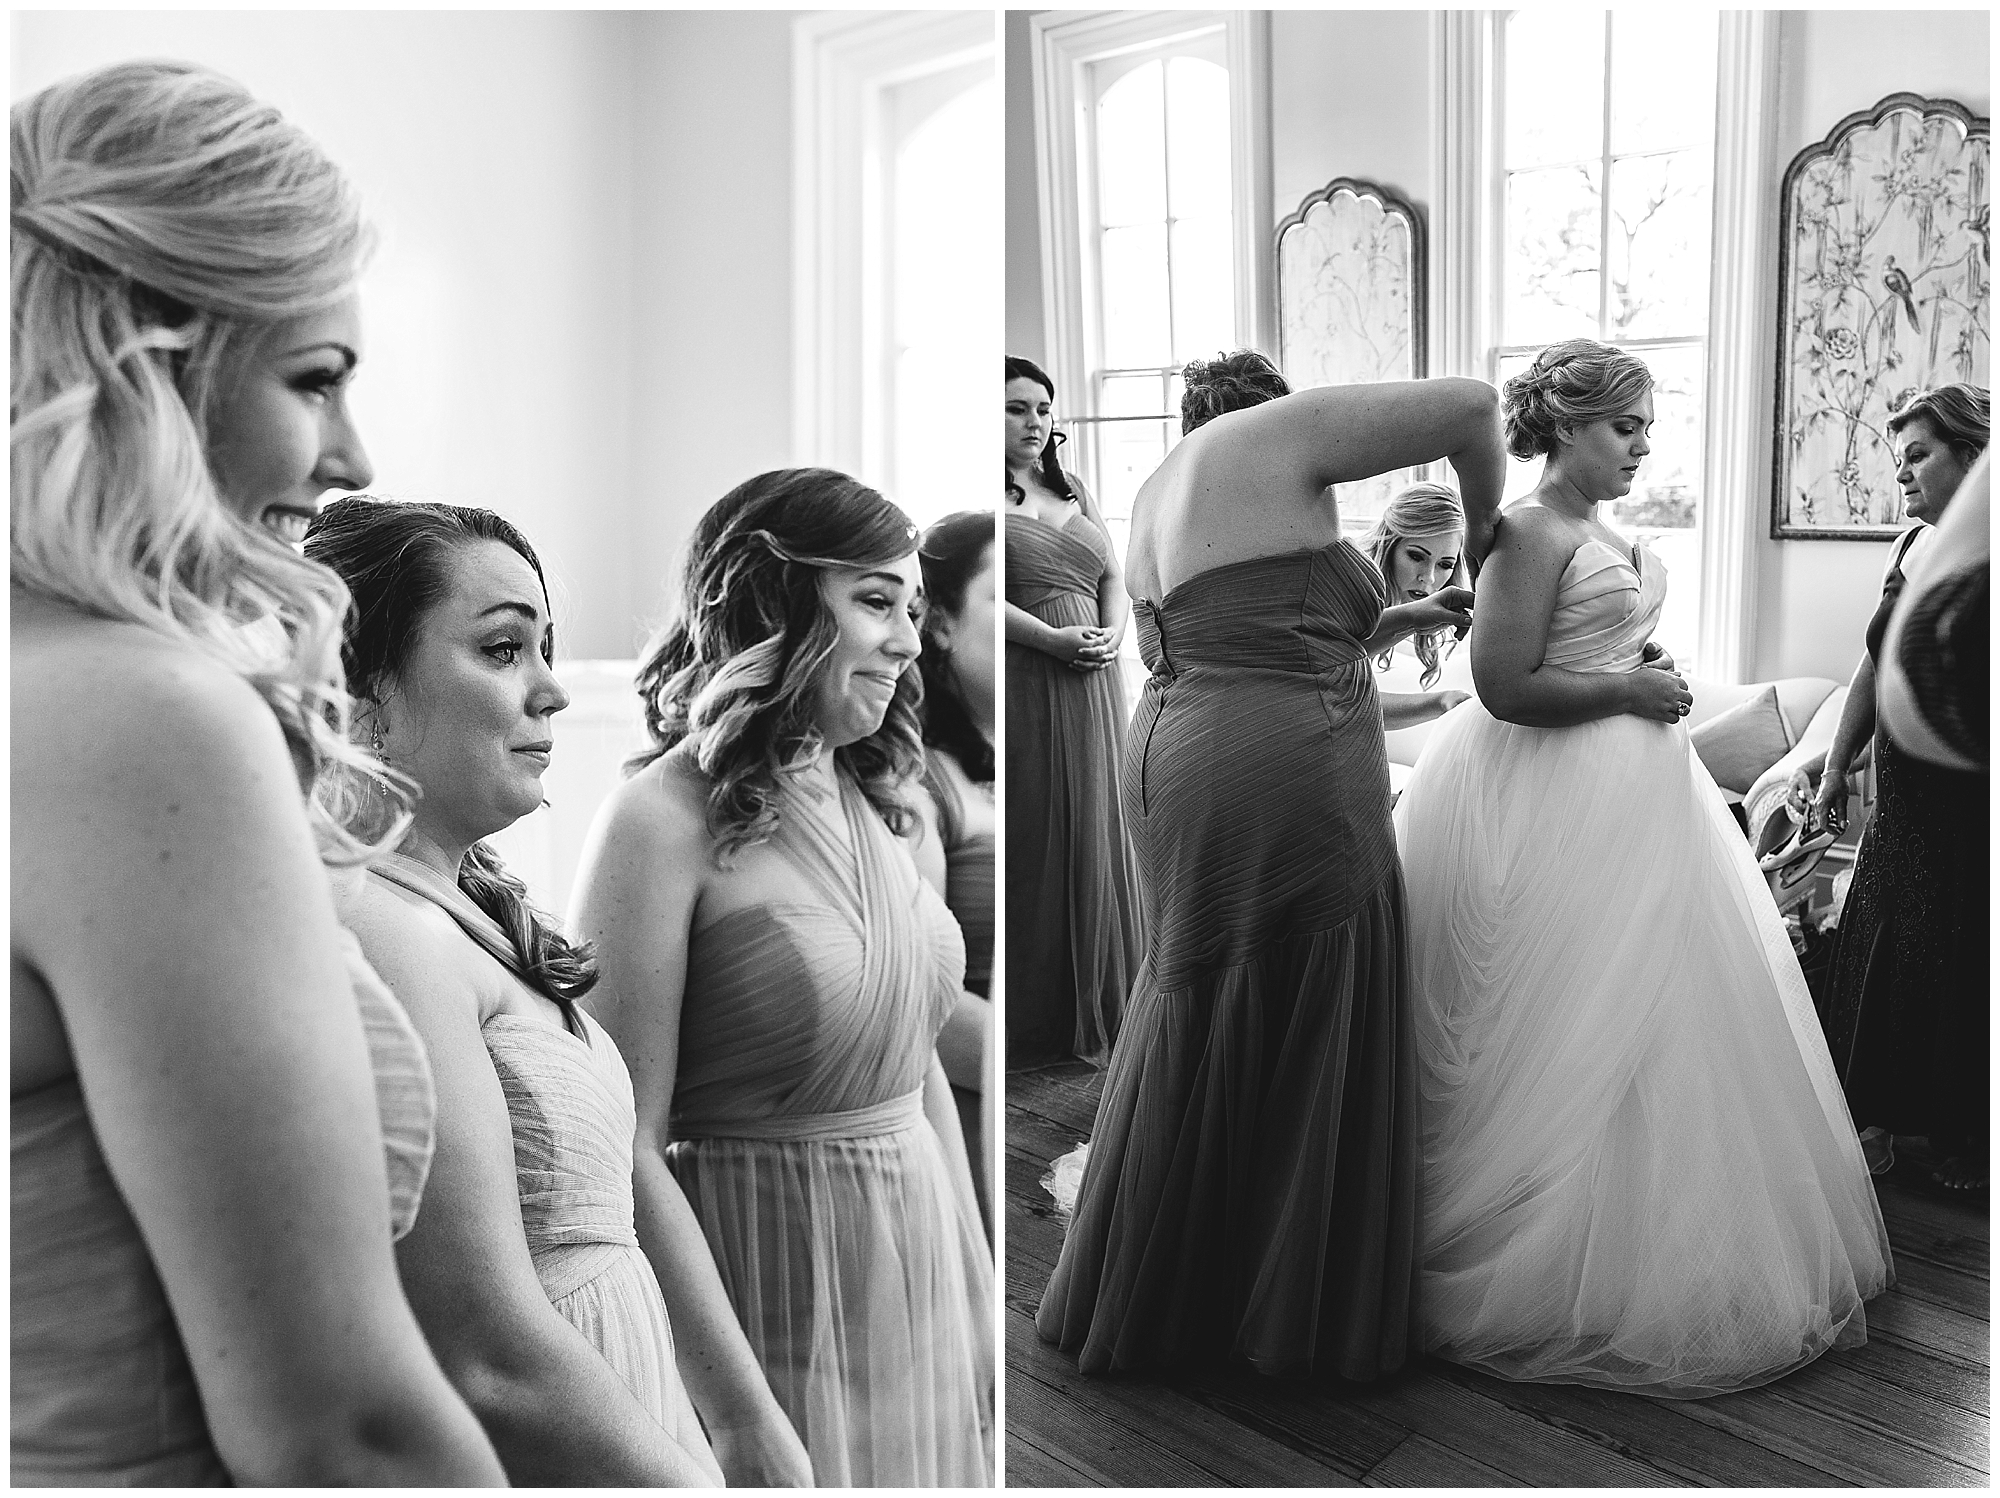 Merrimon-Wynne-Raleigh-Wedding-6.jpg